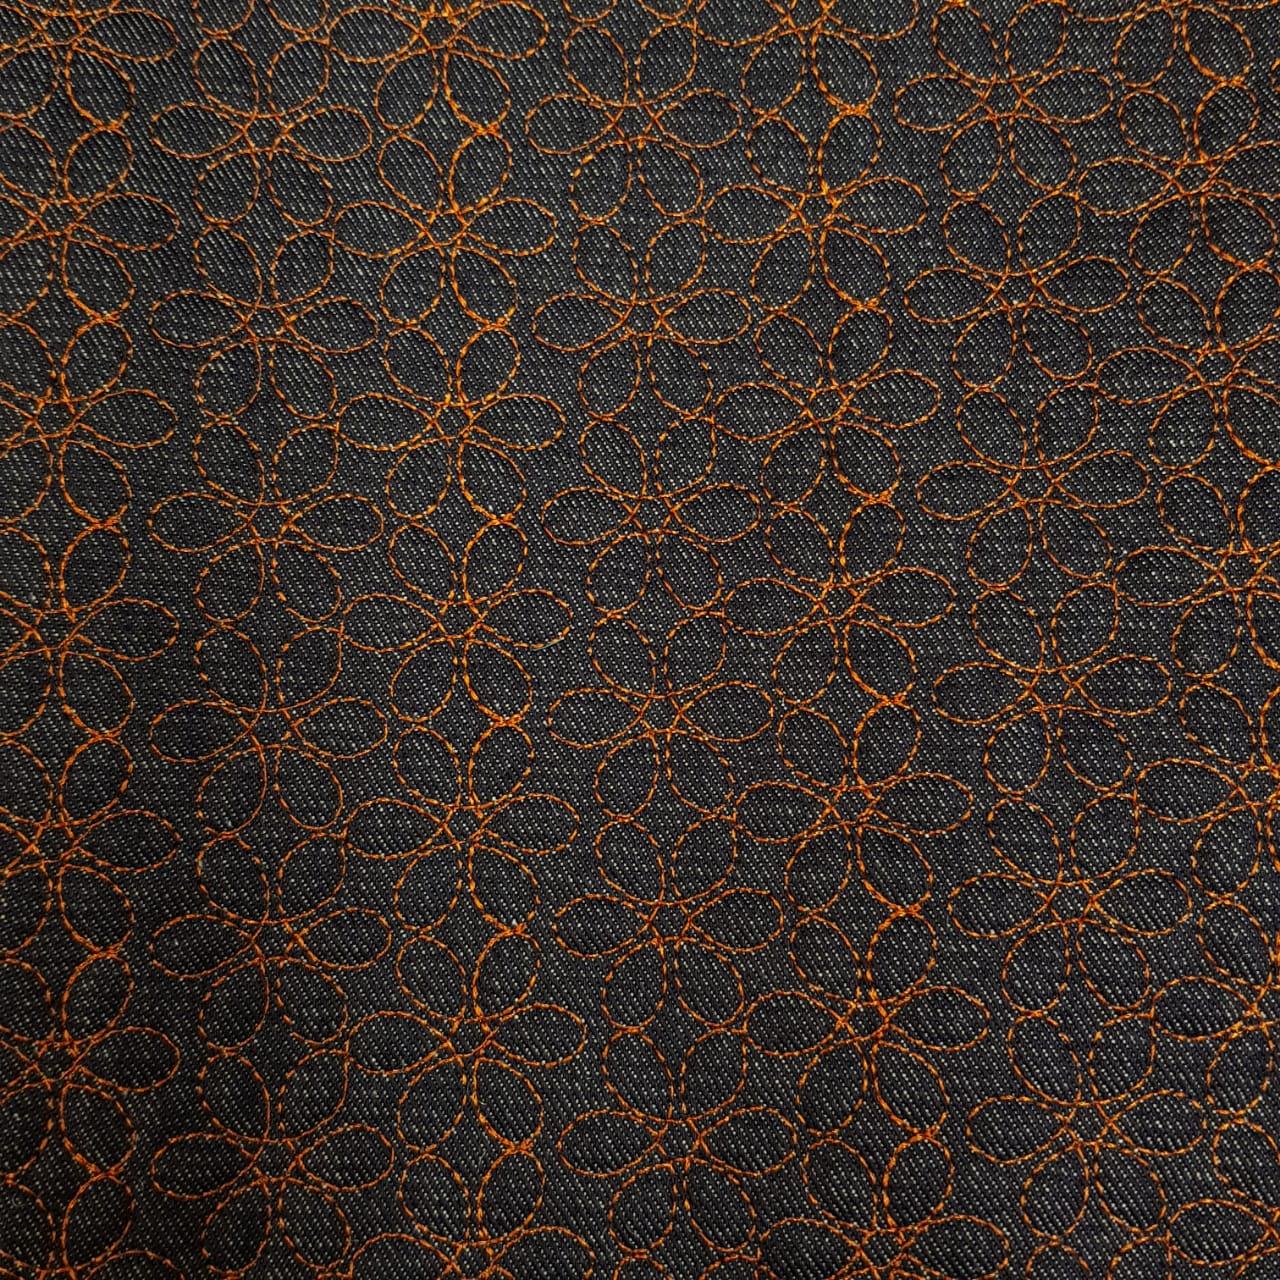 Jeans matelassado -  flores - 50x150cm